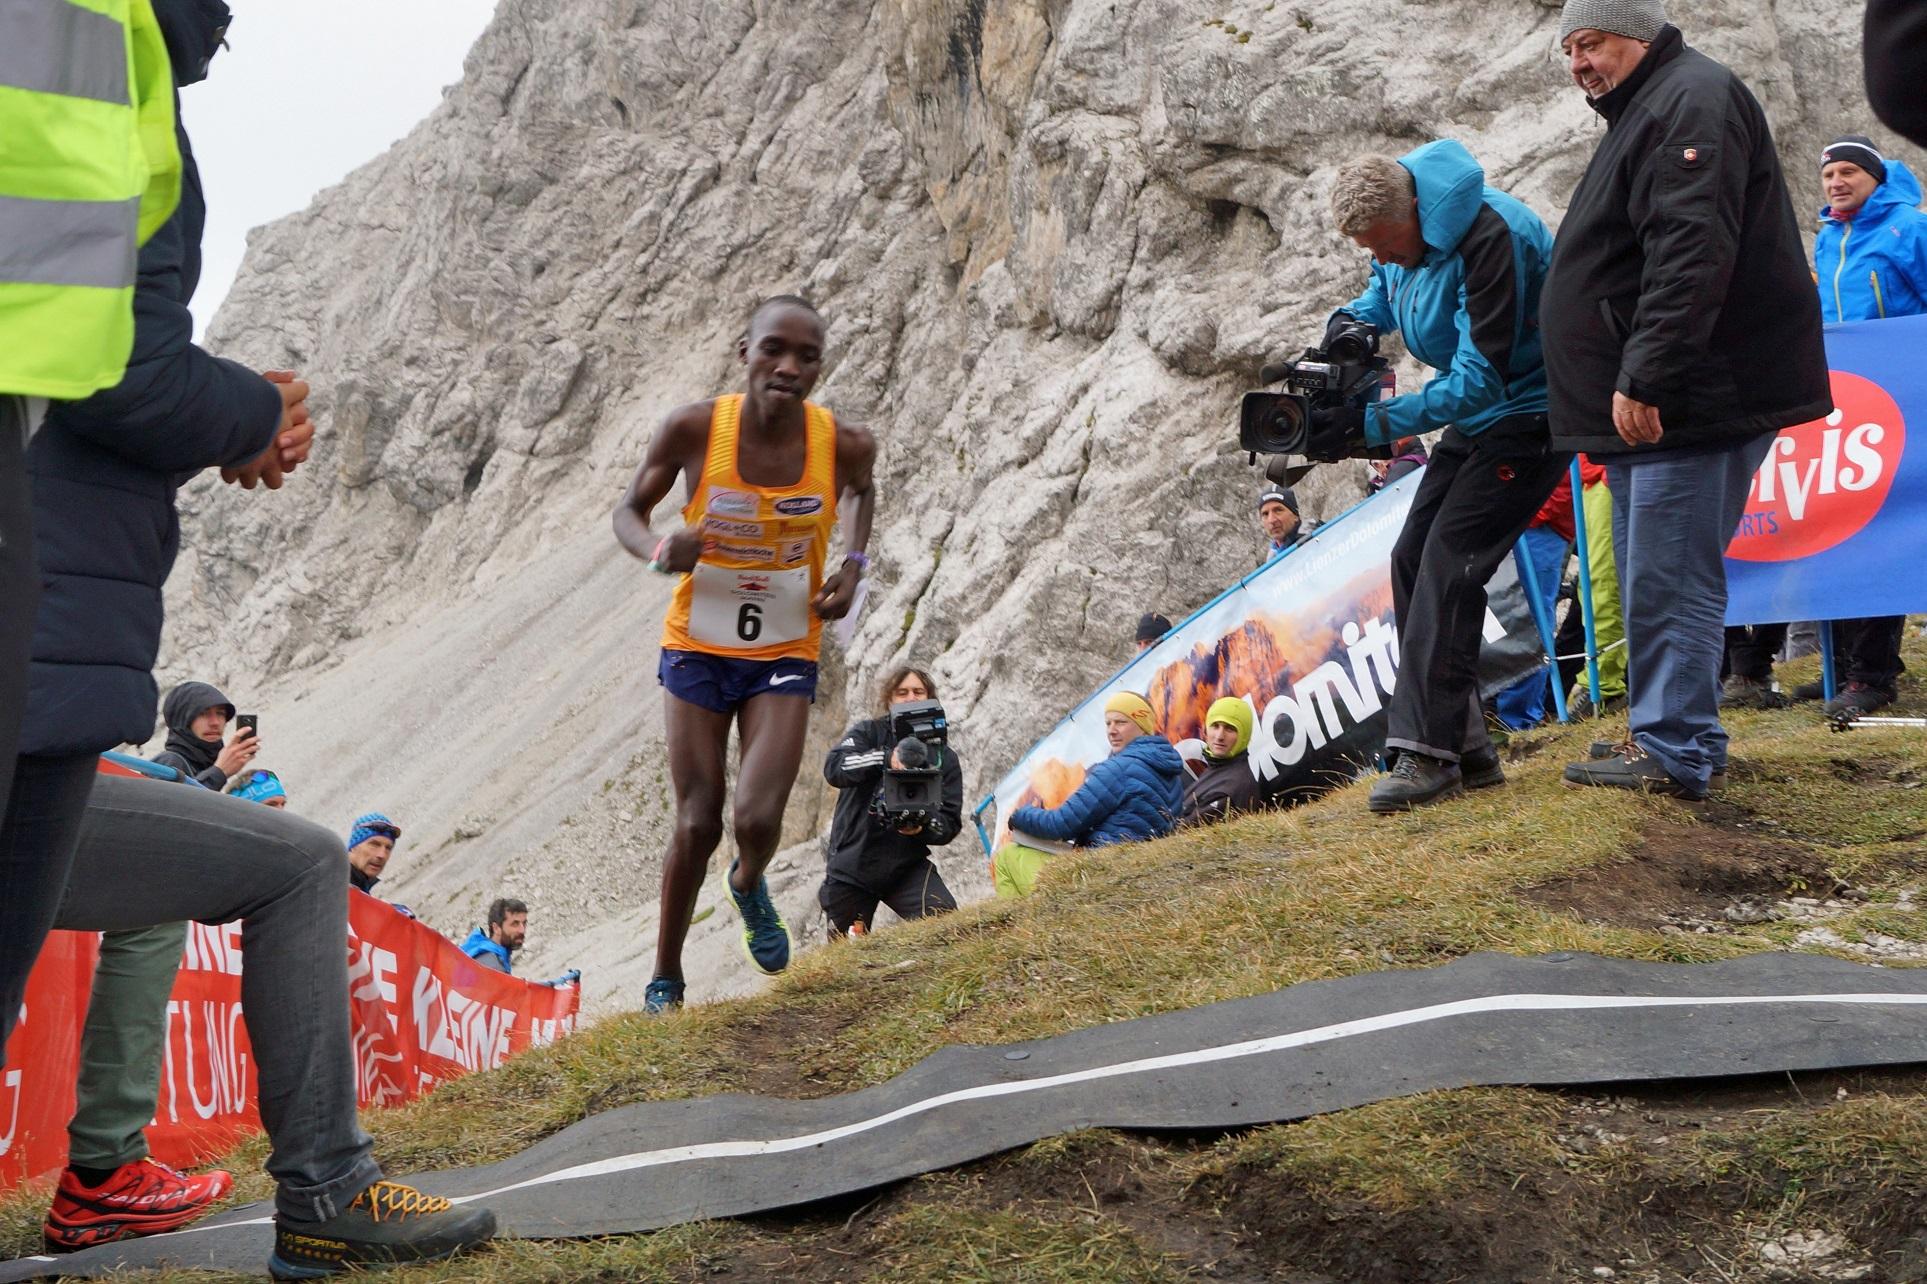 Berglauf-Weltmeister Victor Kiplangat